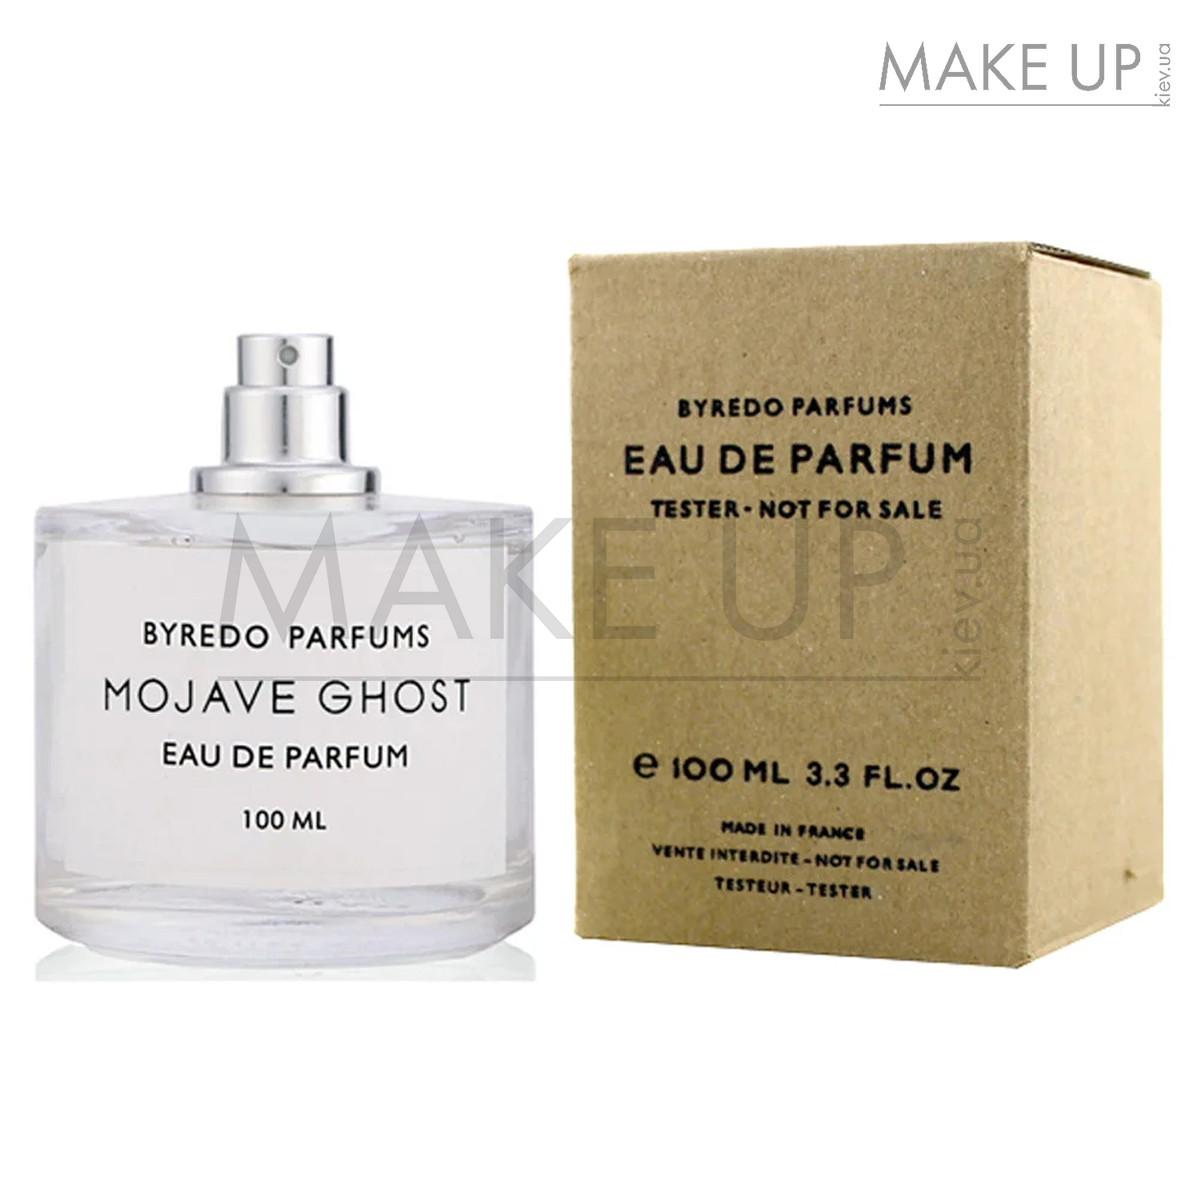 Tester женская парфюмированная вода Byredo Parfums Mojave Ghost edp 100 мл. | Лиц. ОАЭ Тестер